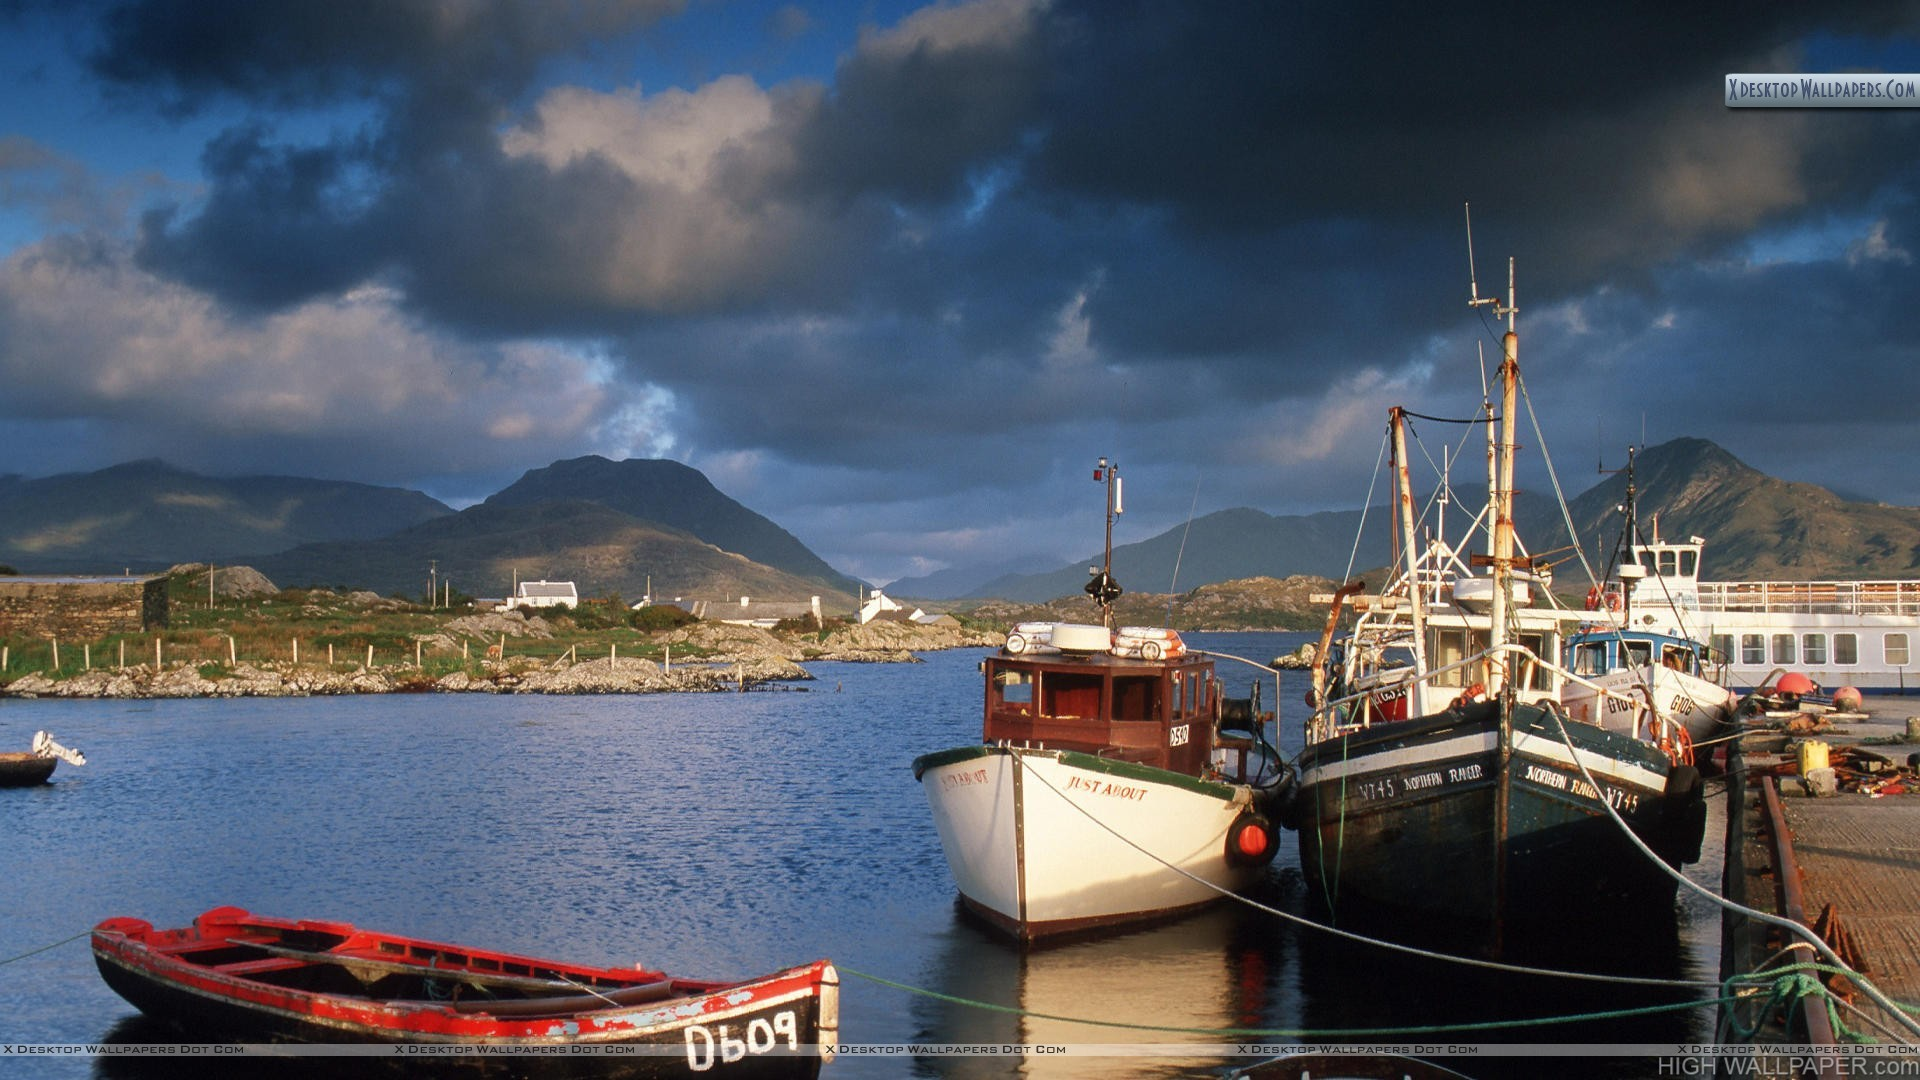 Ballynakill Harbor Connemara County Galway Ireland